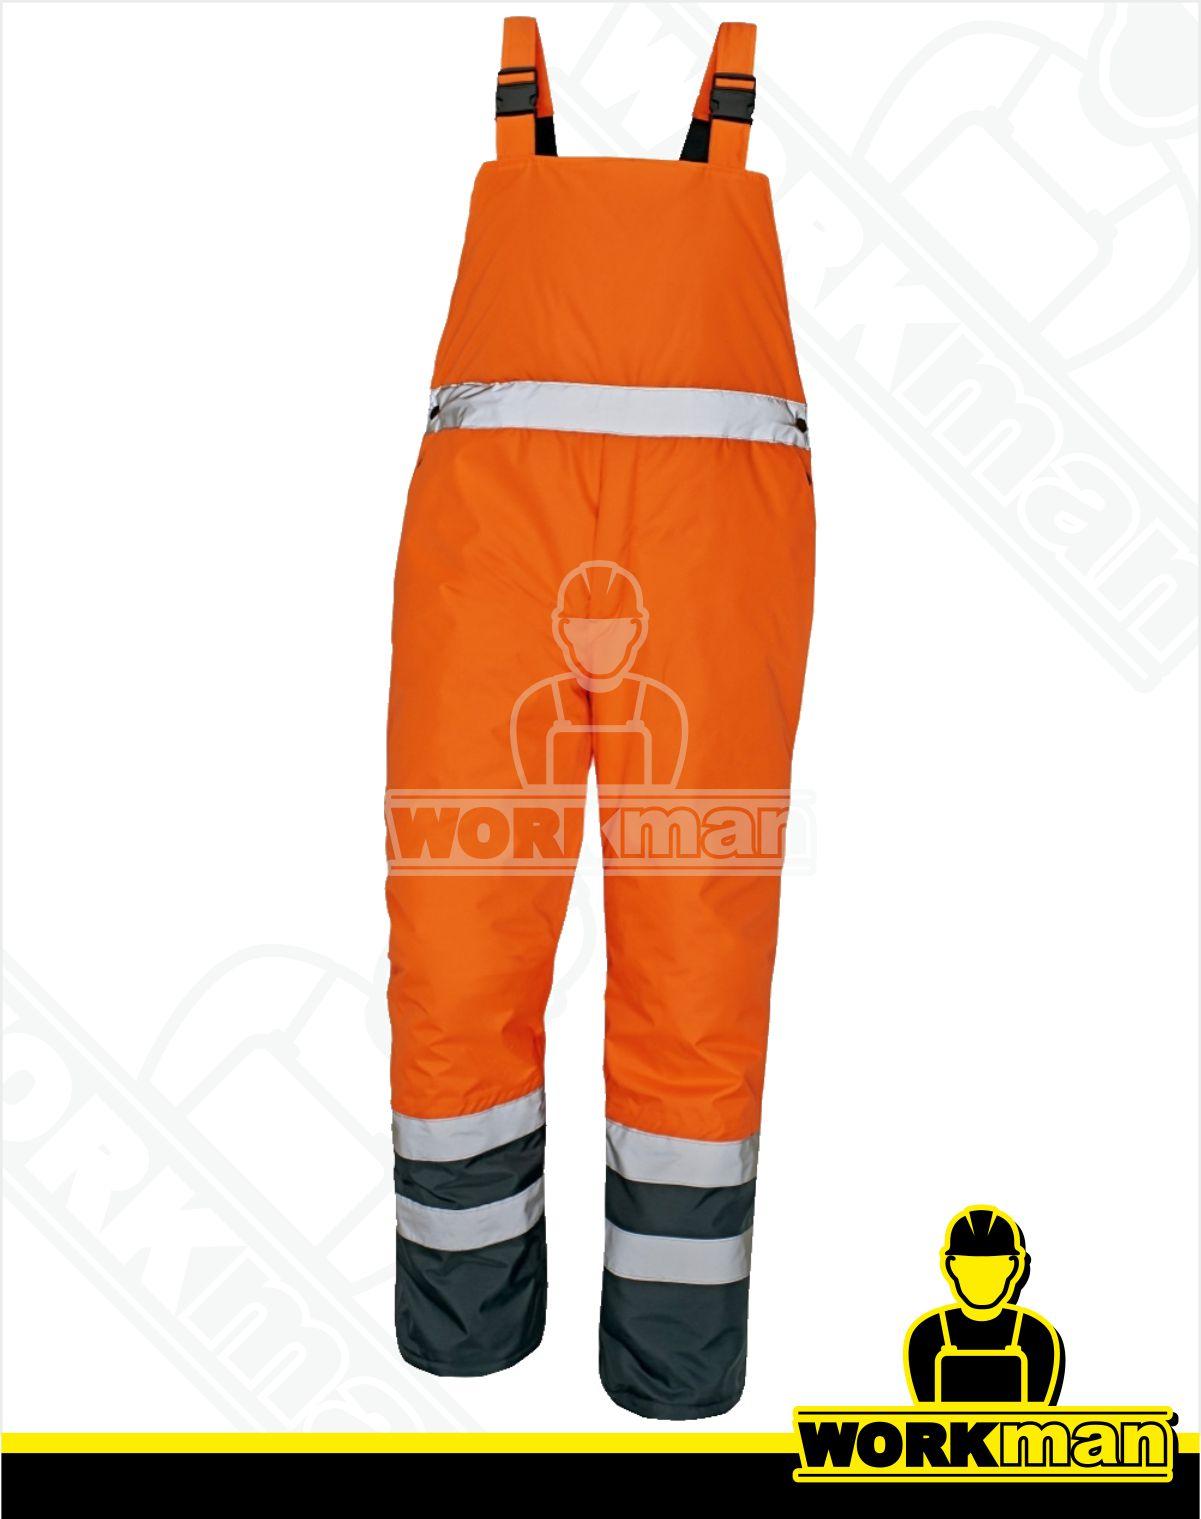 Zateplené reflexné nohavice PADSTOW HV Červa oranžová Pracovné odevy 858b44a0f18